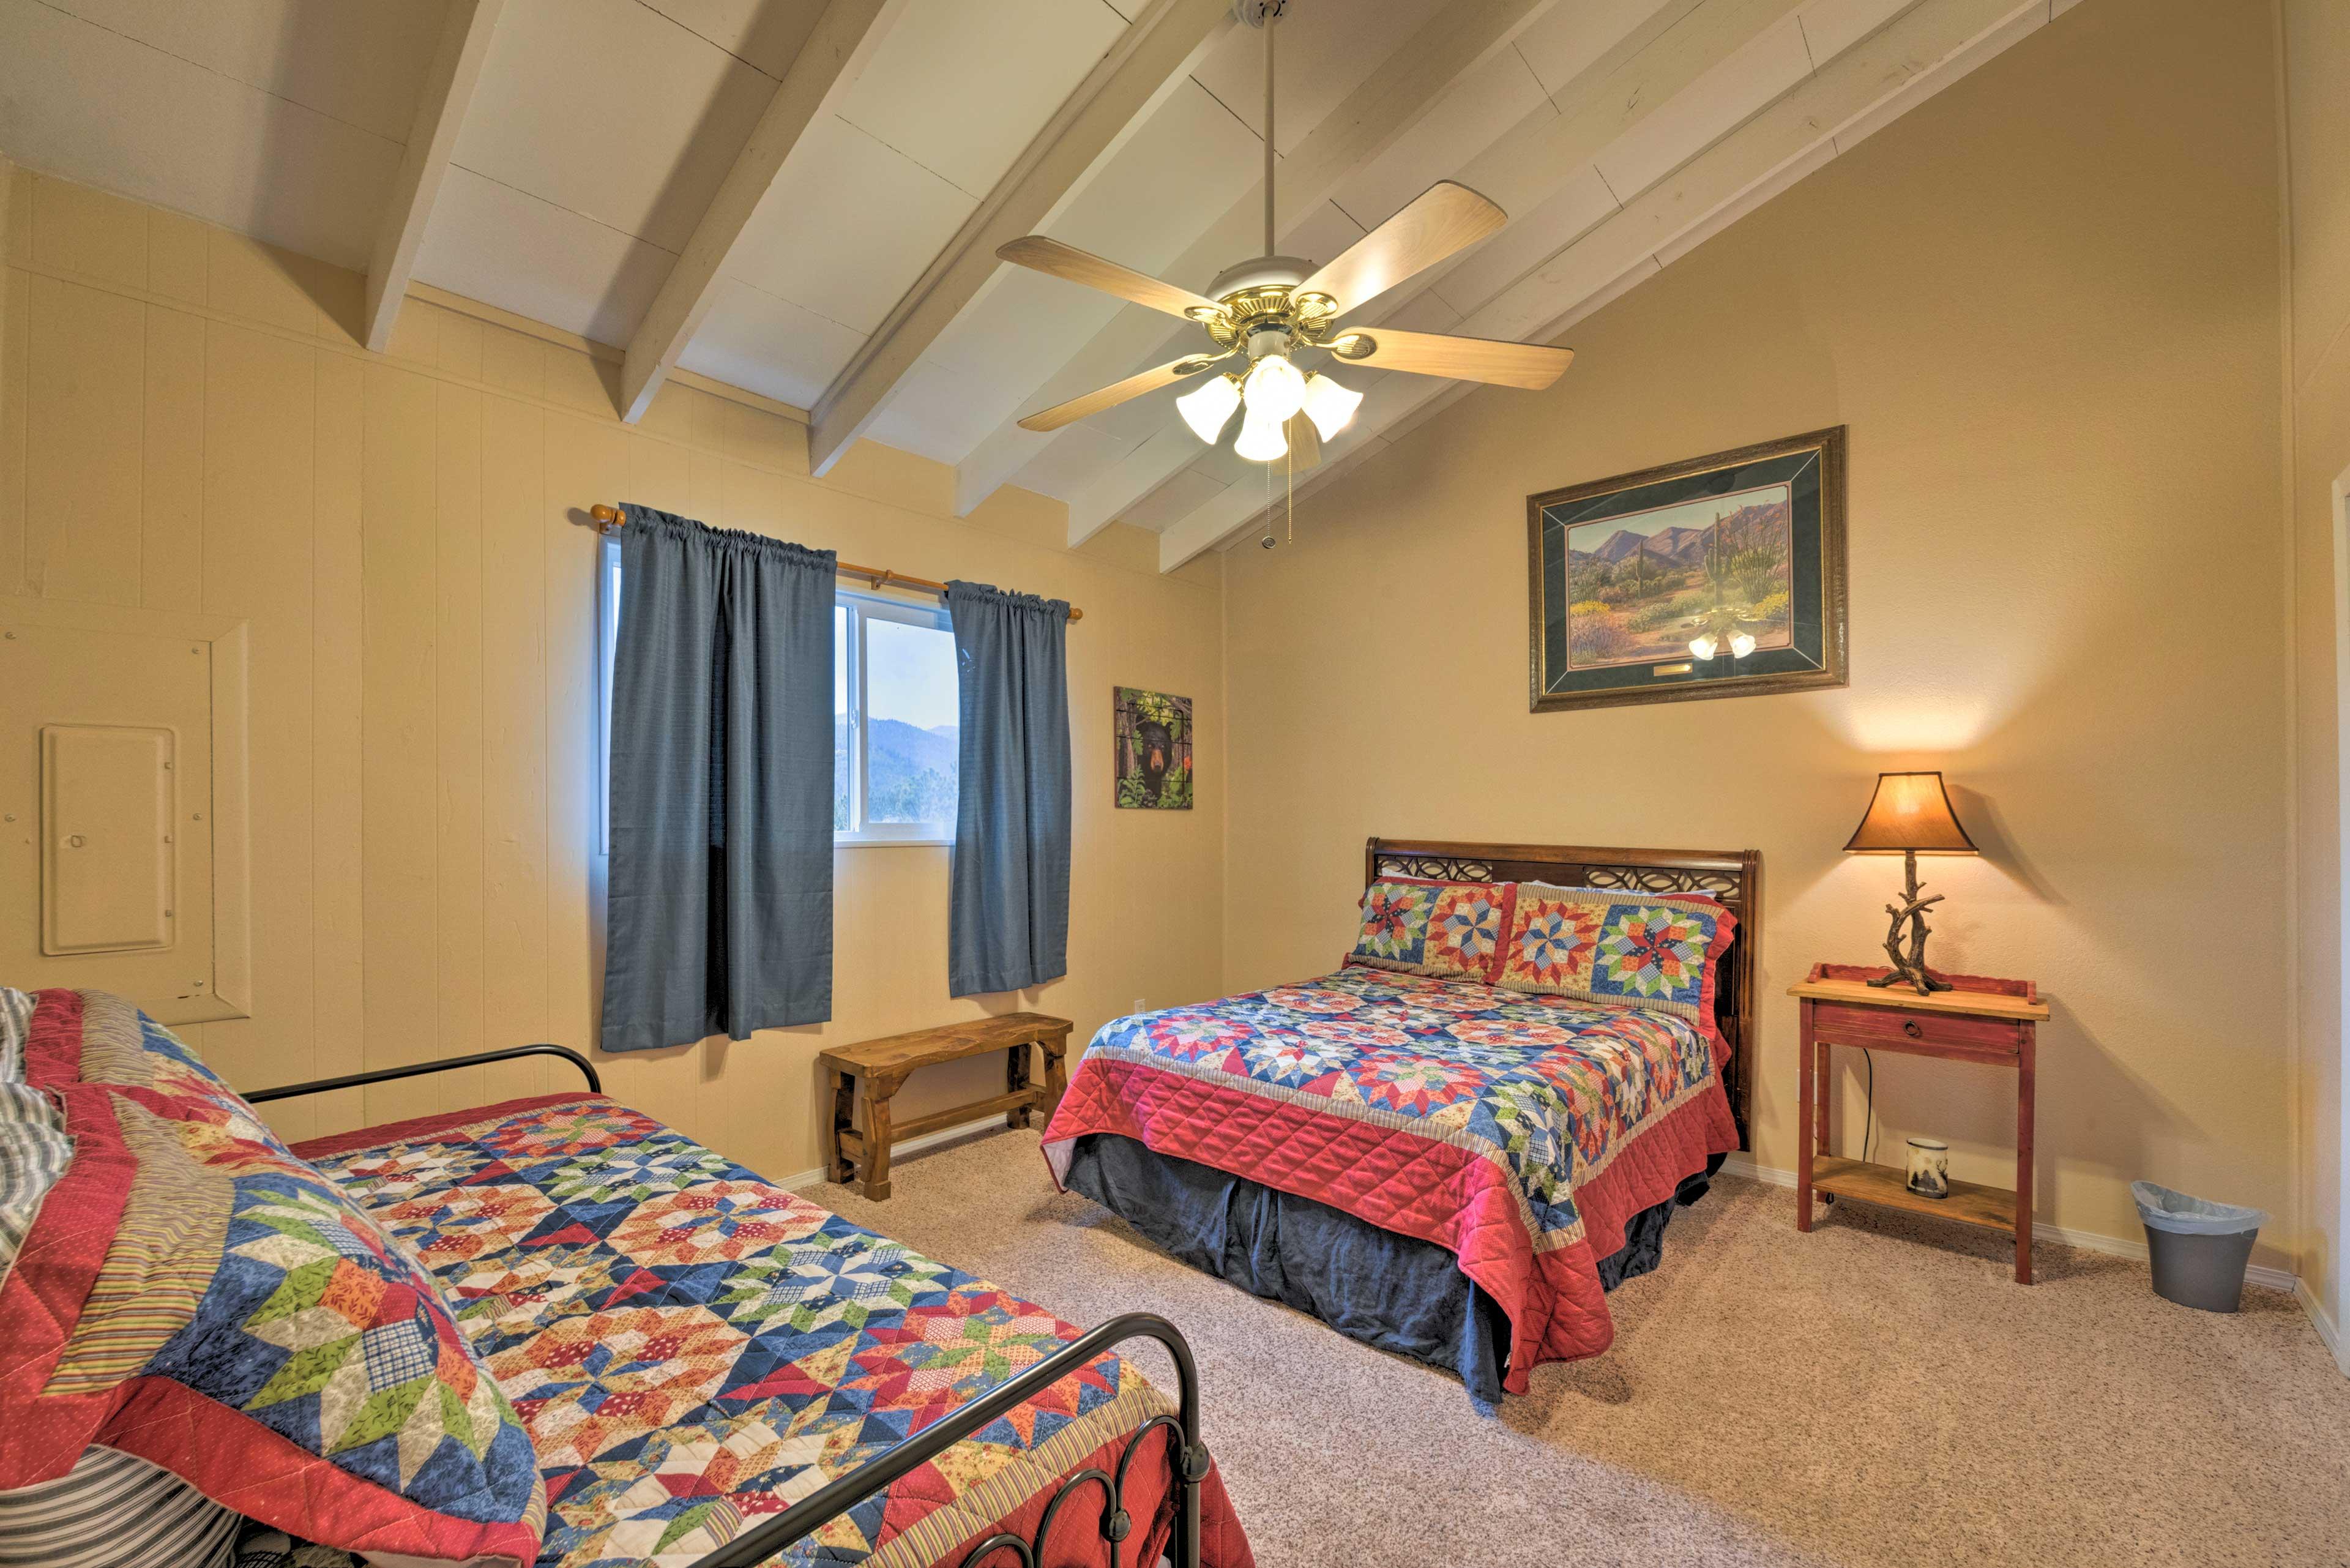 Sleep 4 in this charming bedroom.